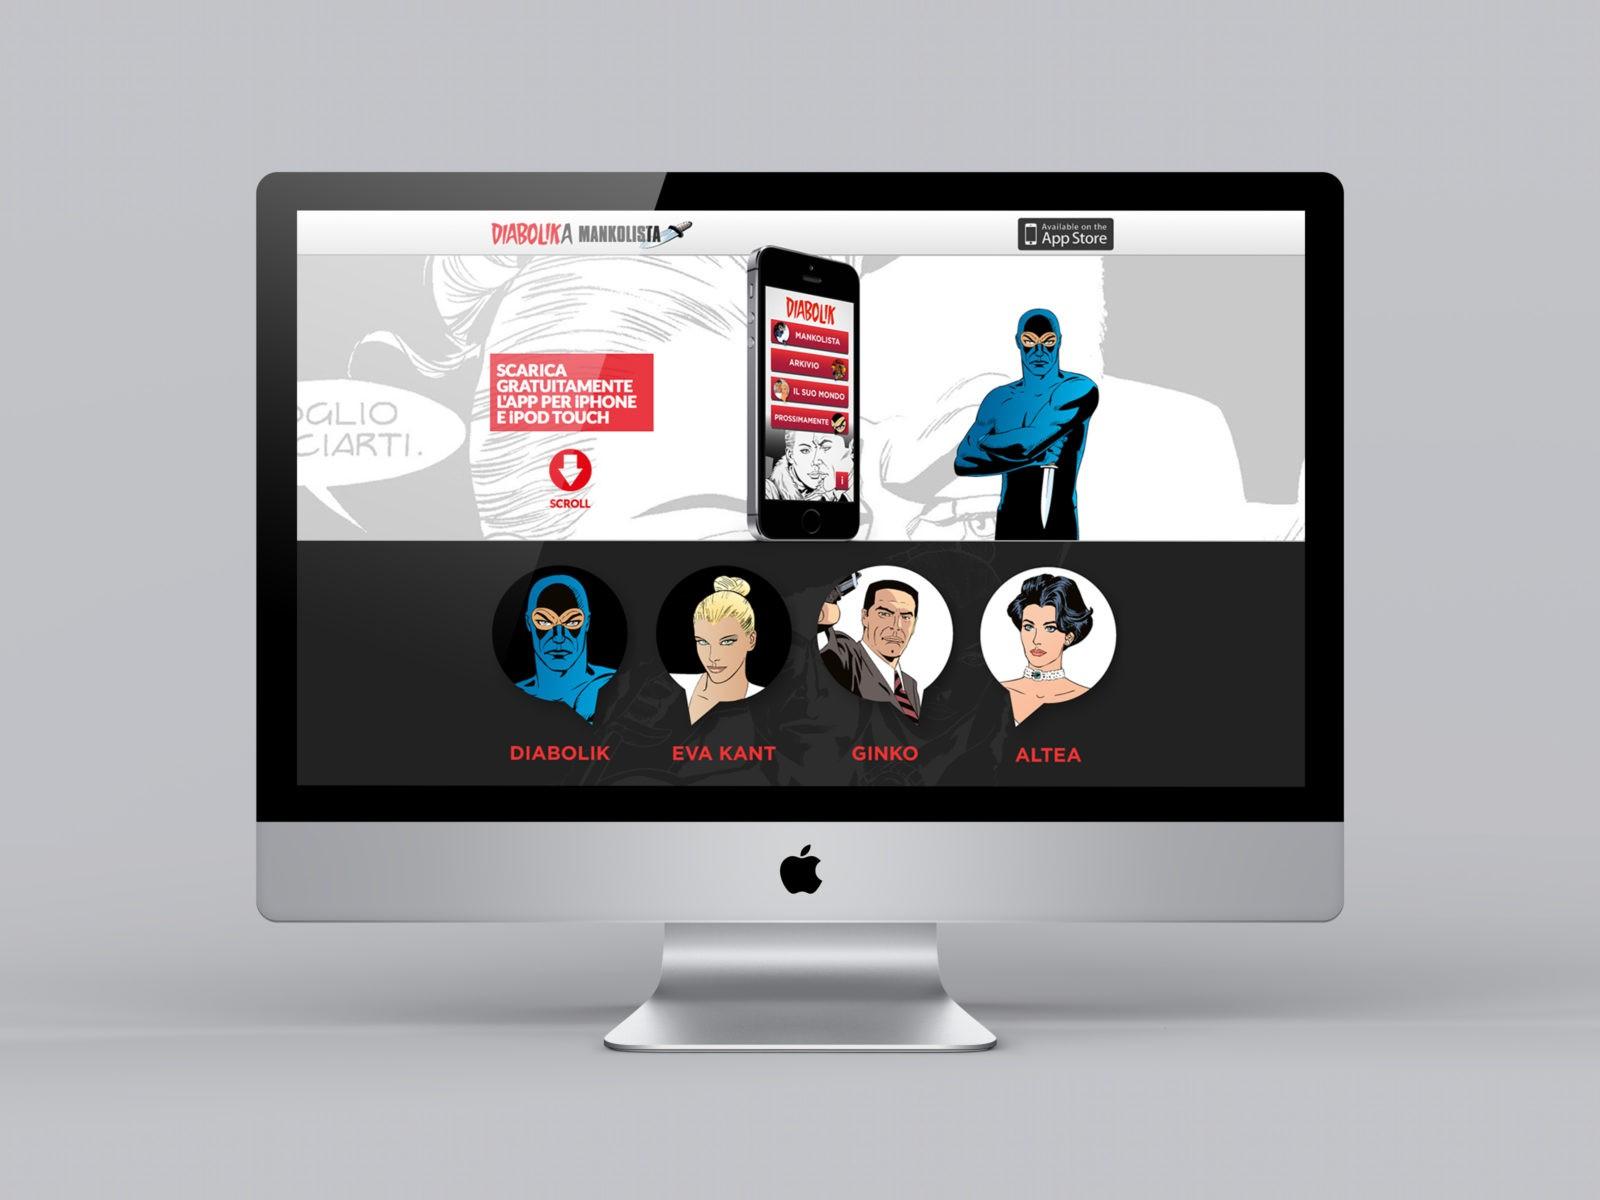 Diabolika Mankolista website